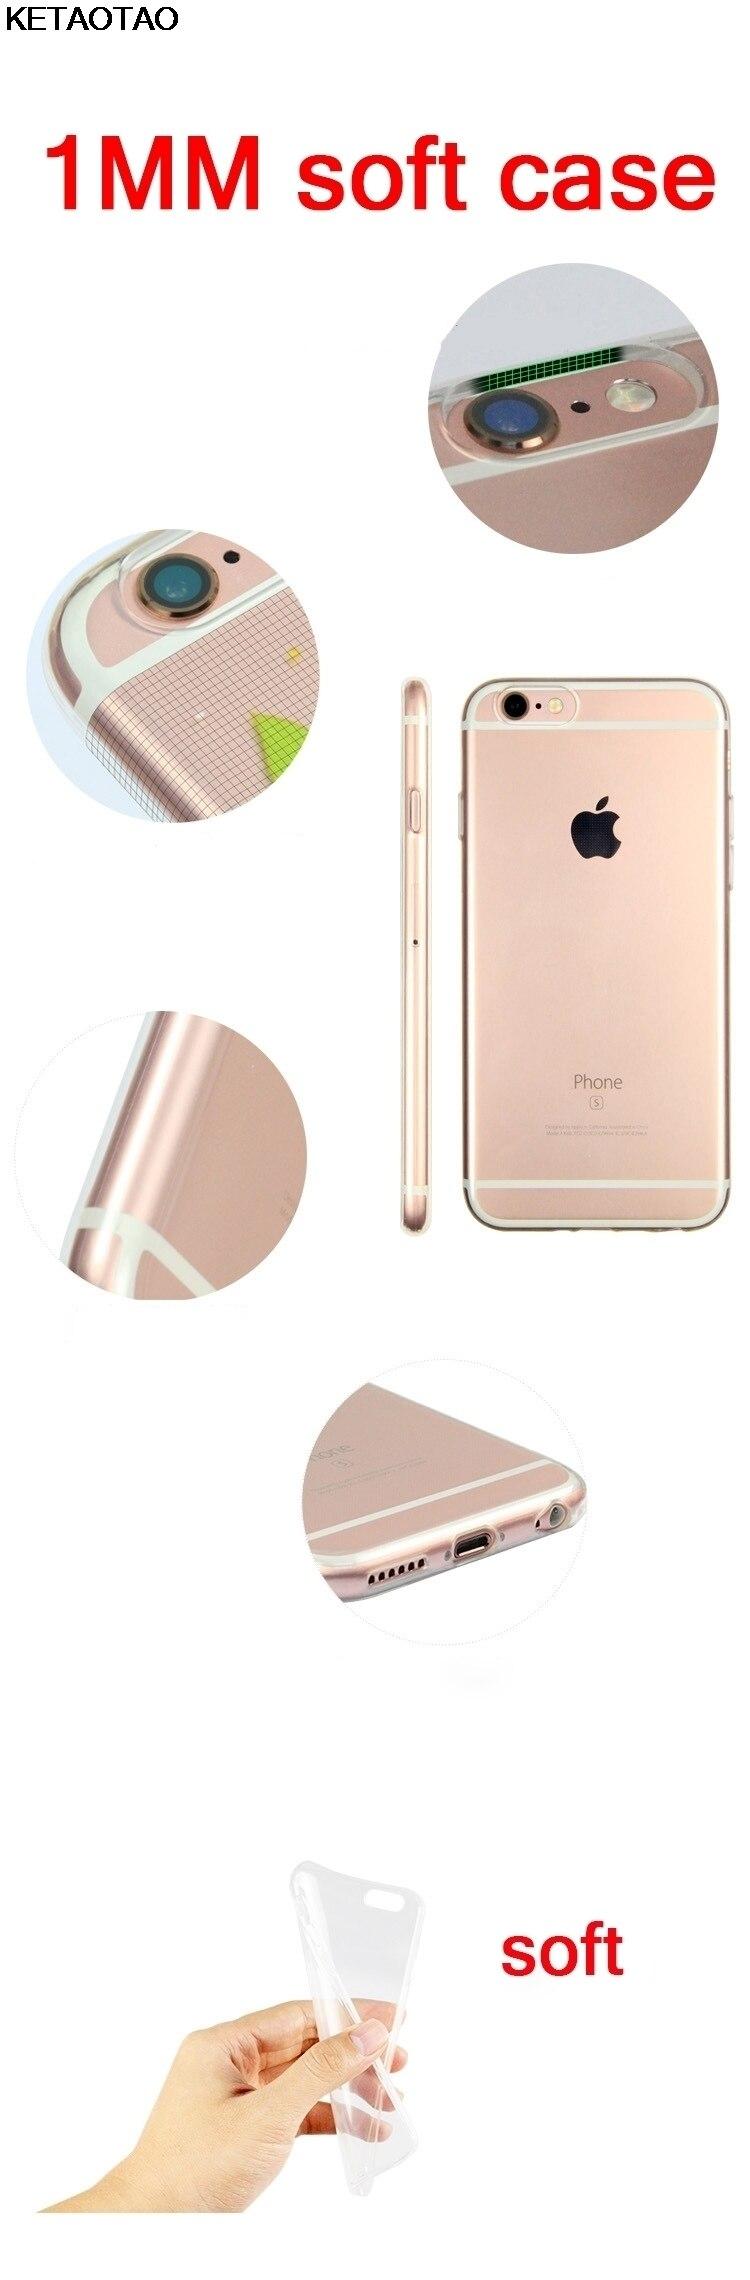 Ketaotao lindo gris anatomía Fundas para móviles para iPhone 4S 5C ...